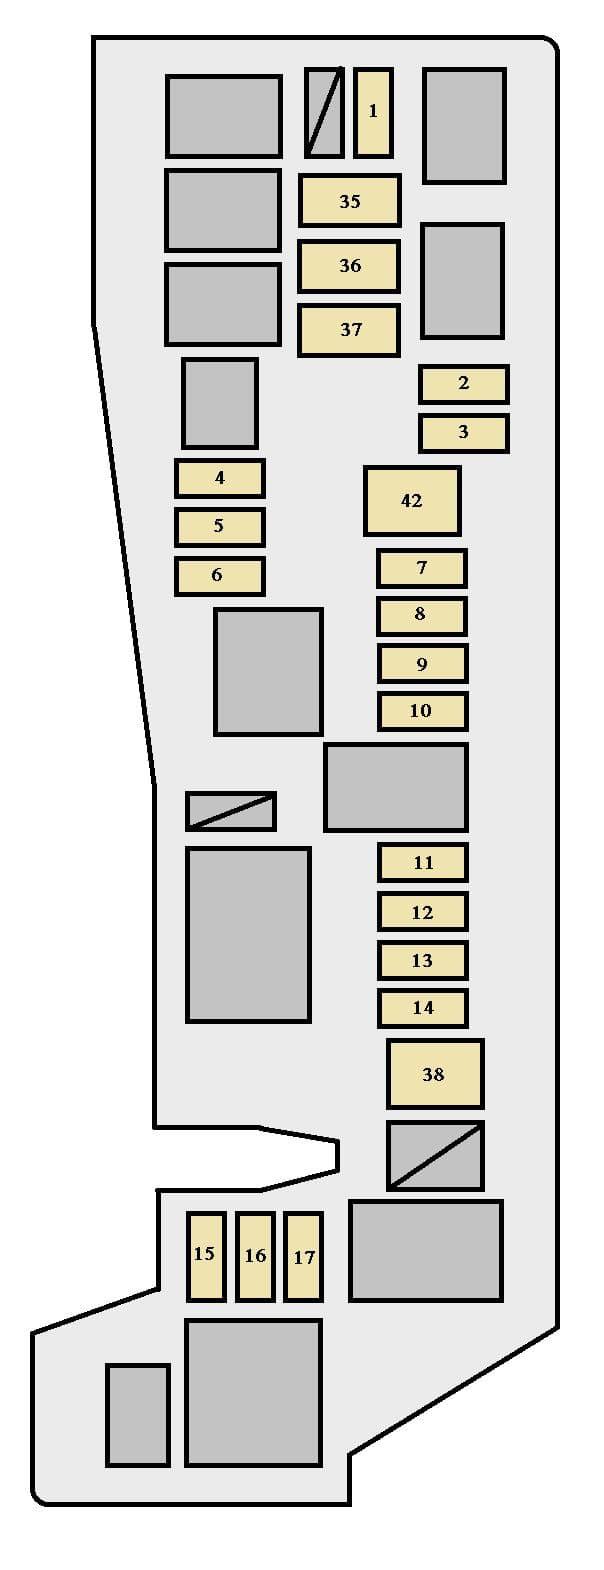 toyota matrix first generation mk1 (e130; 2007 - 2008) – fuse box diagram  |🔧 fuses guru  fuses guru